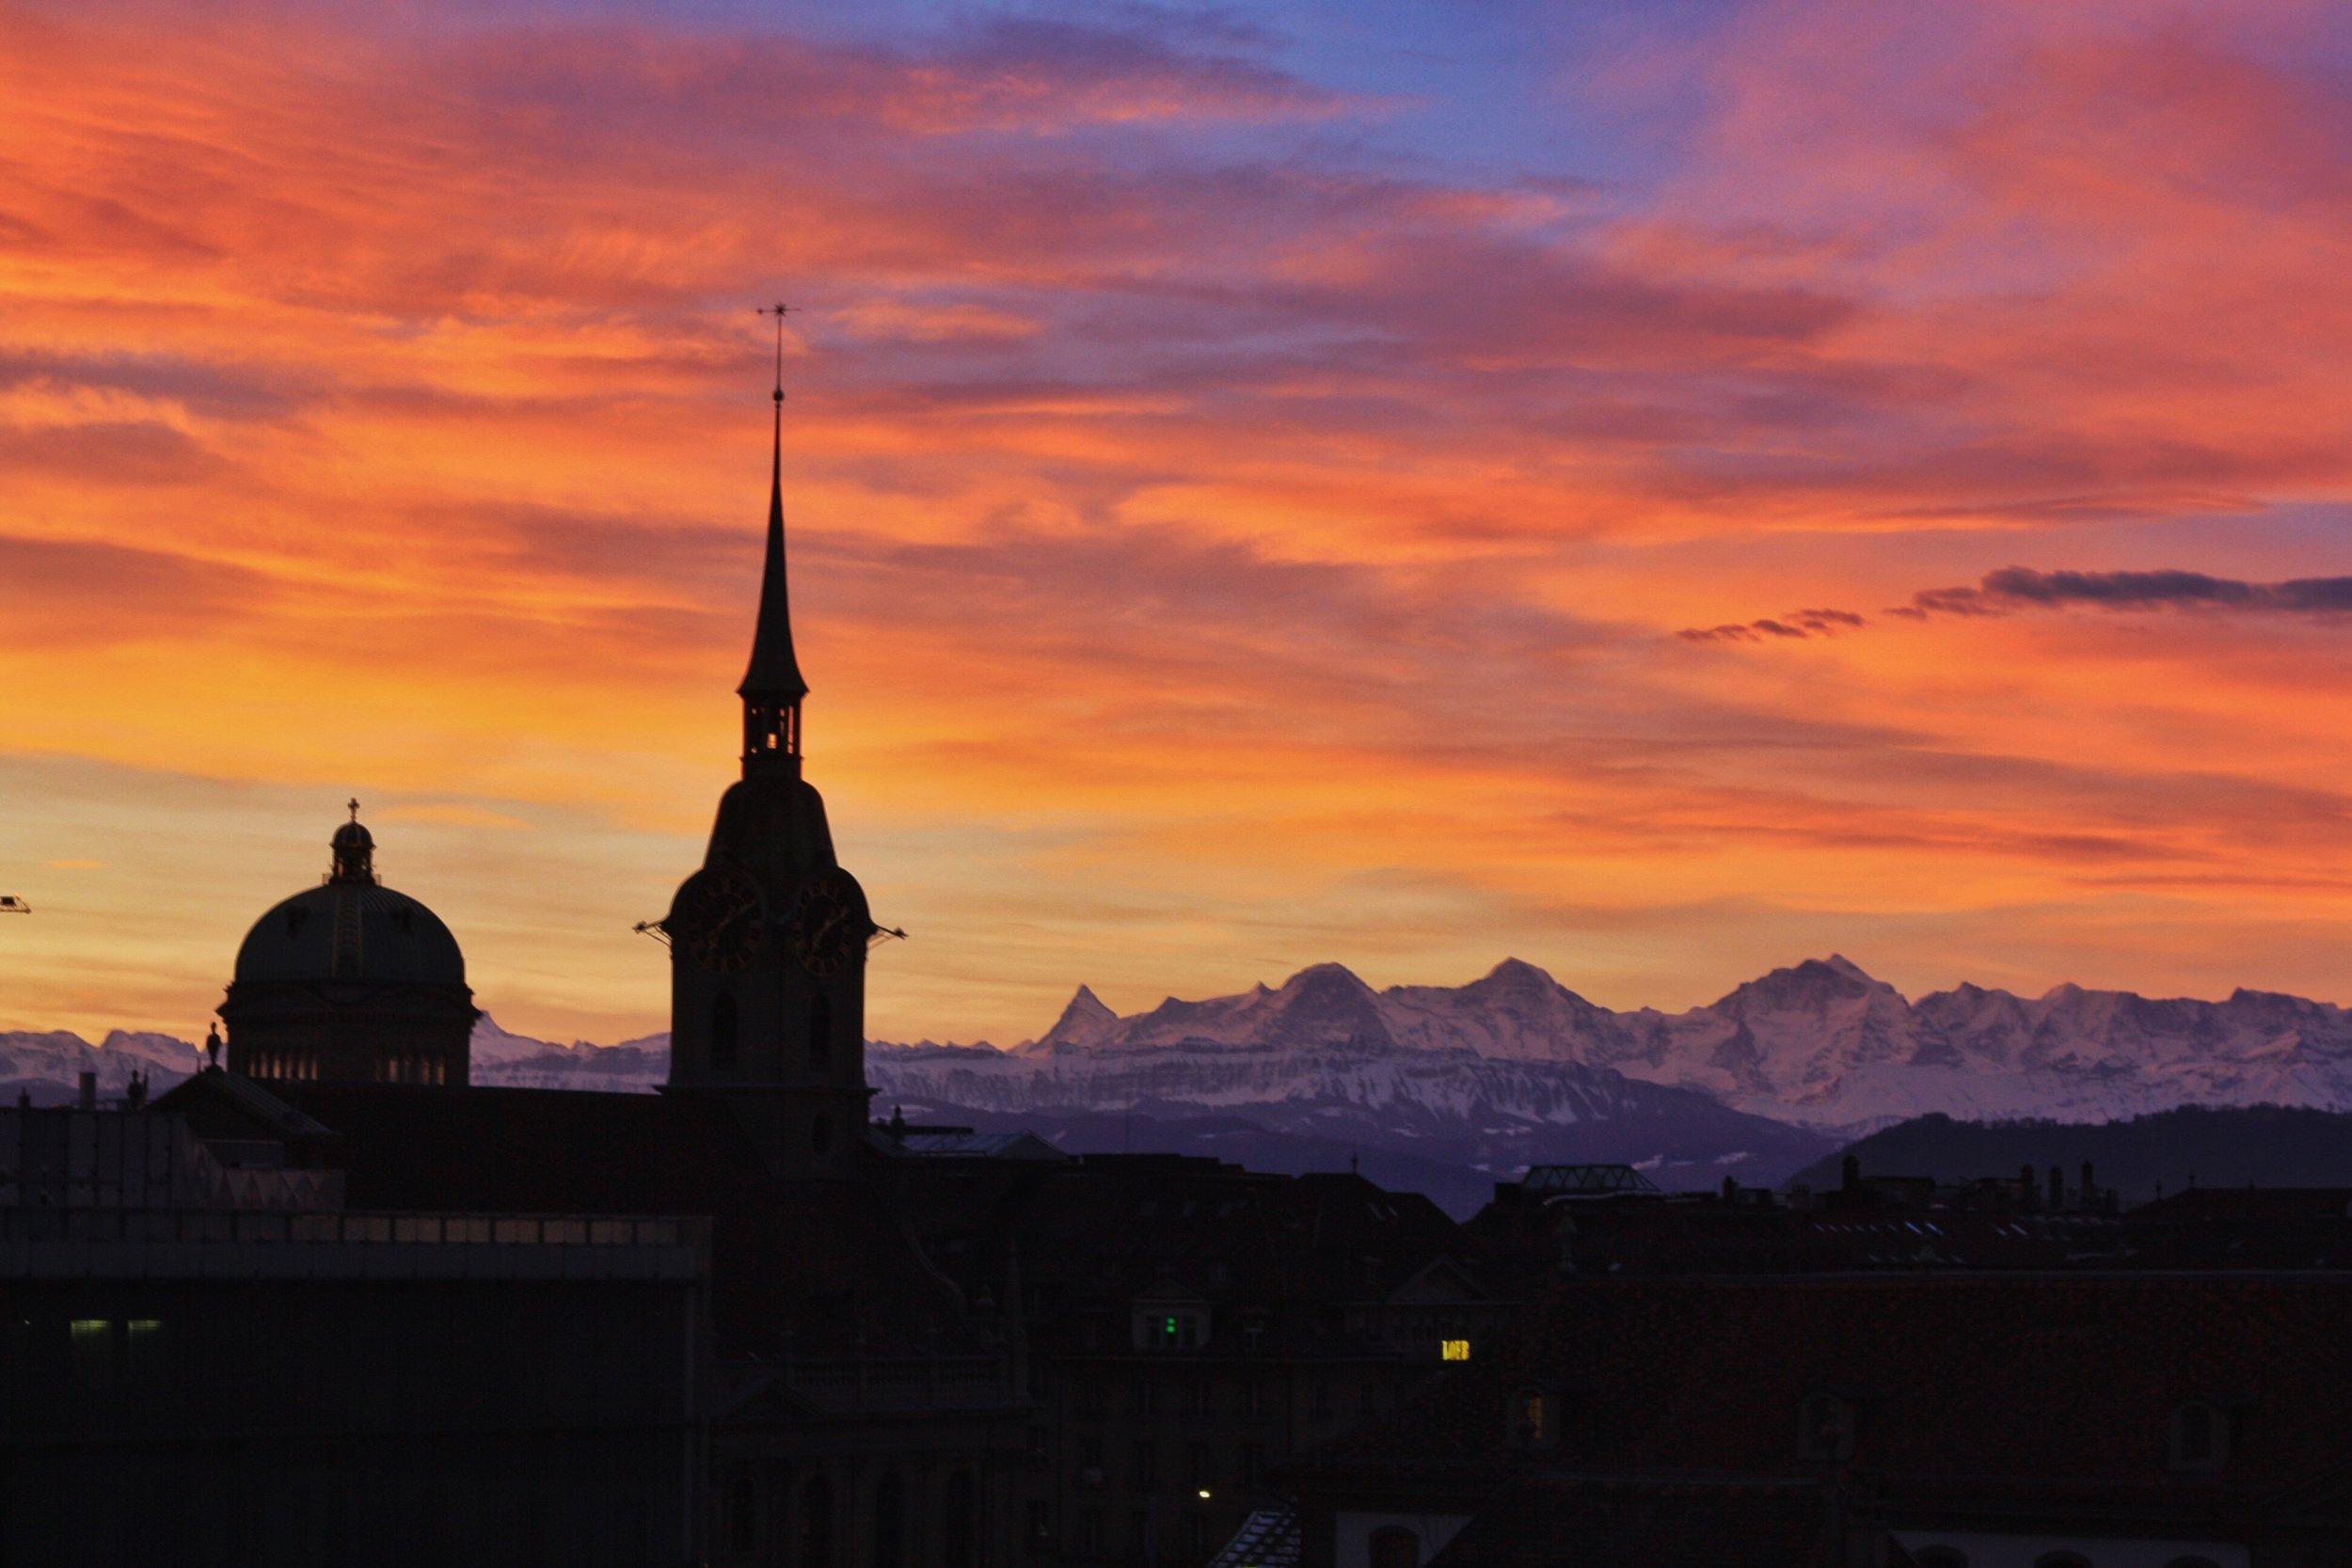 Easter Sunrise in Bern, Switzerland